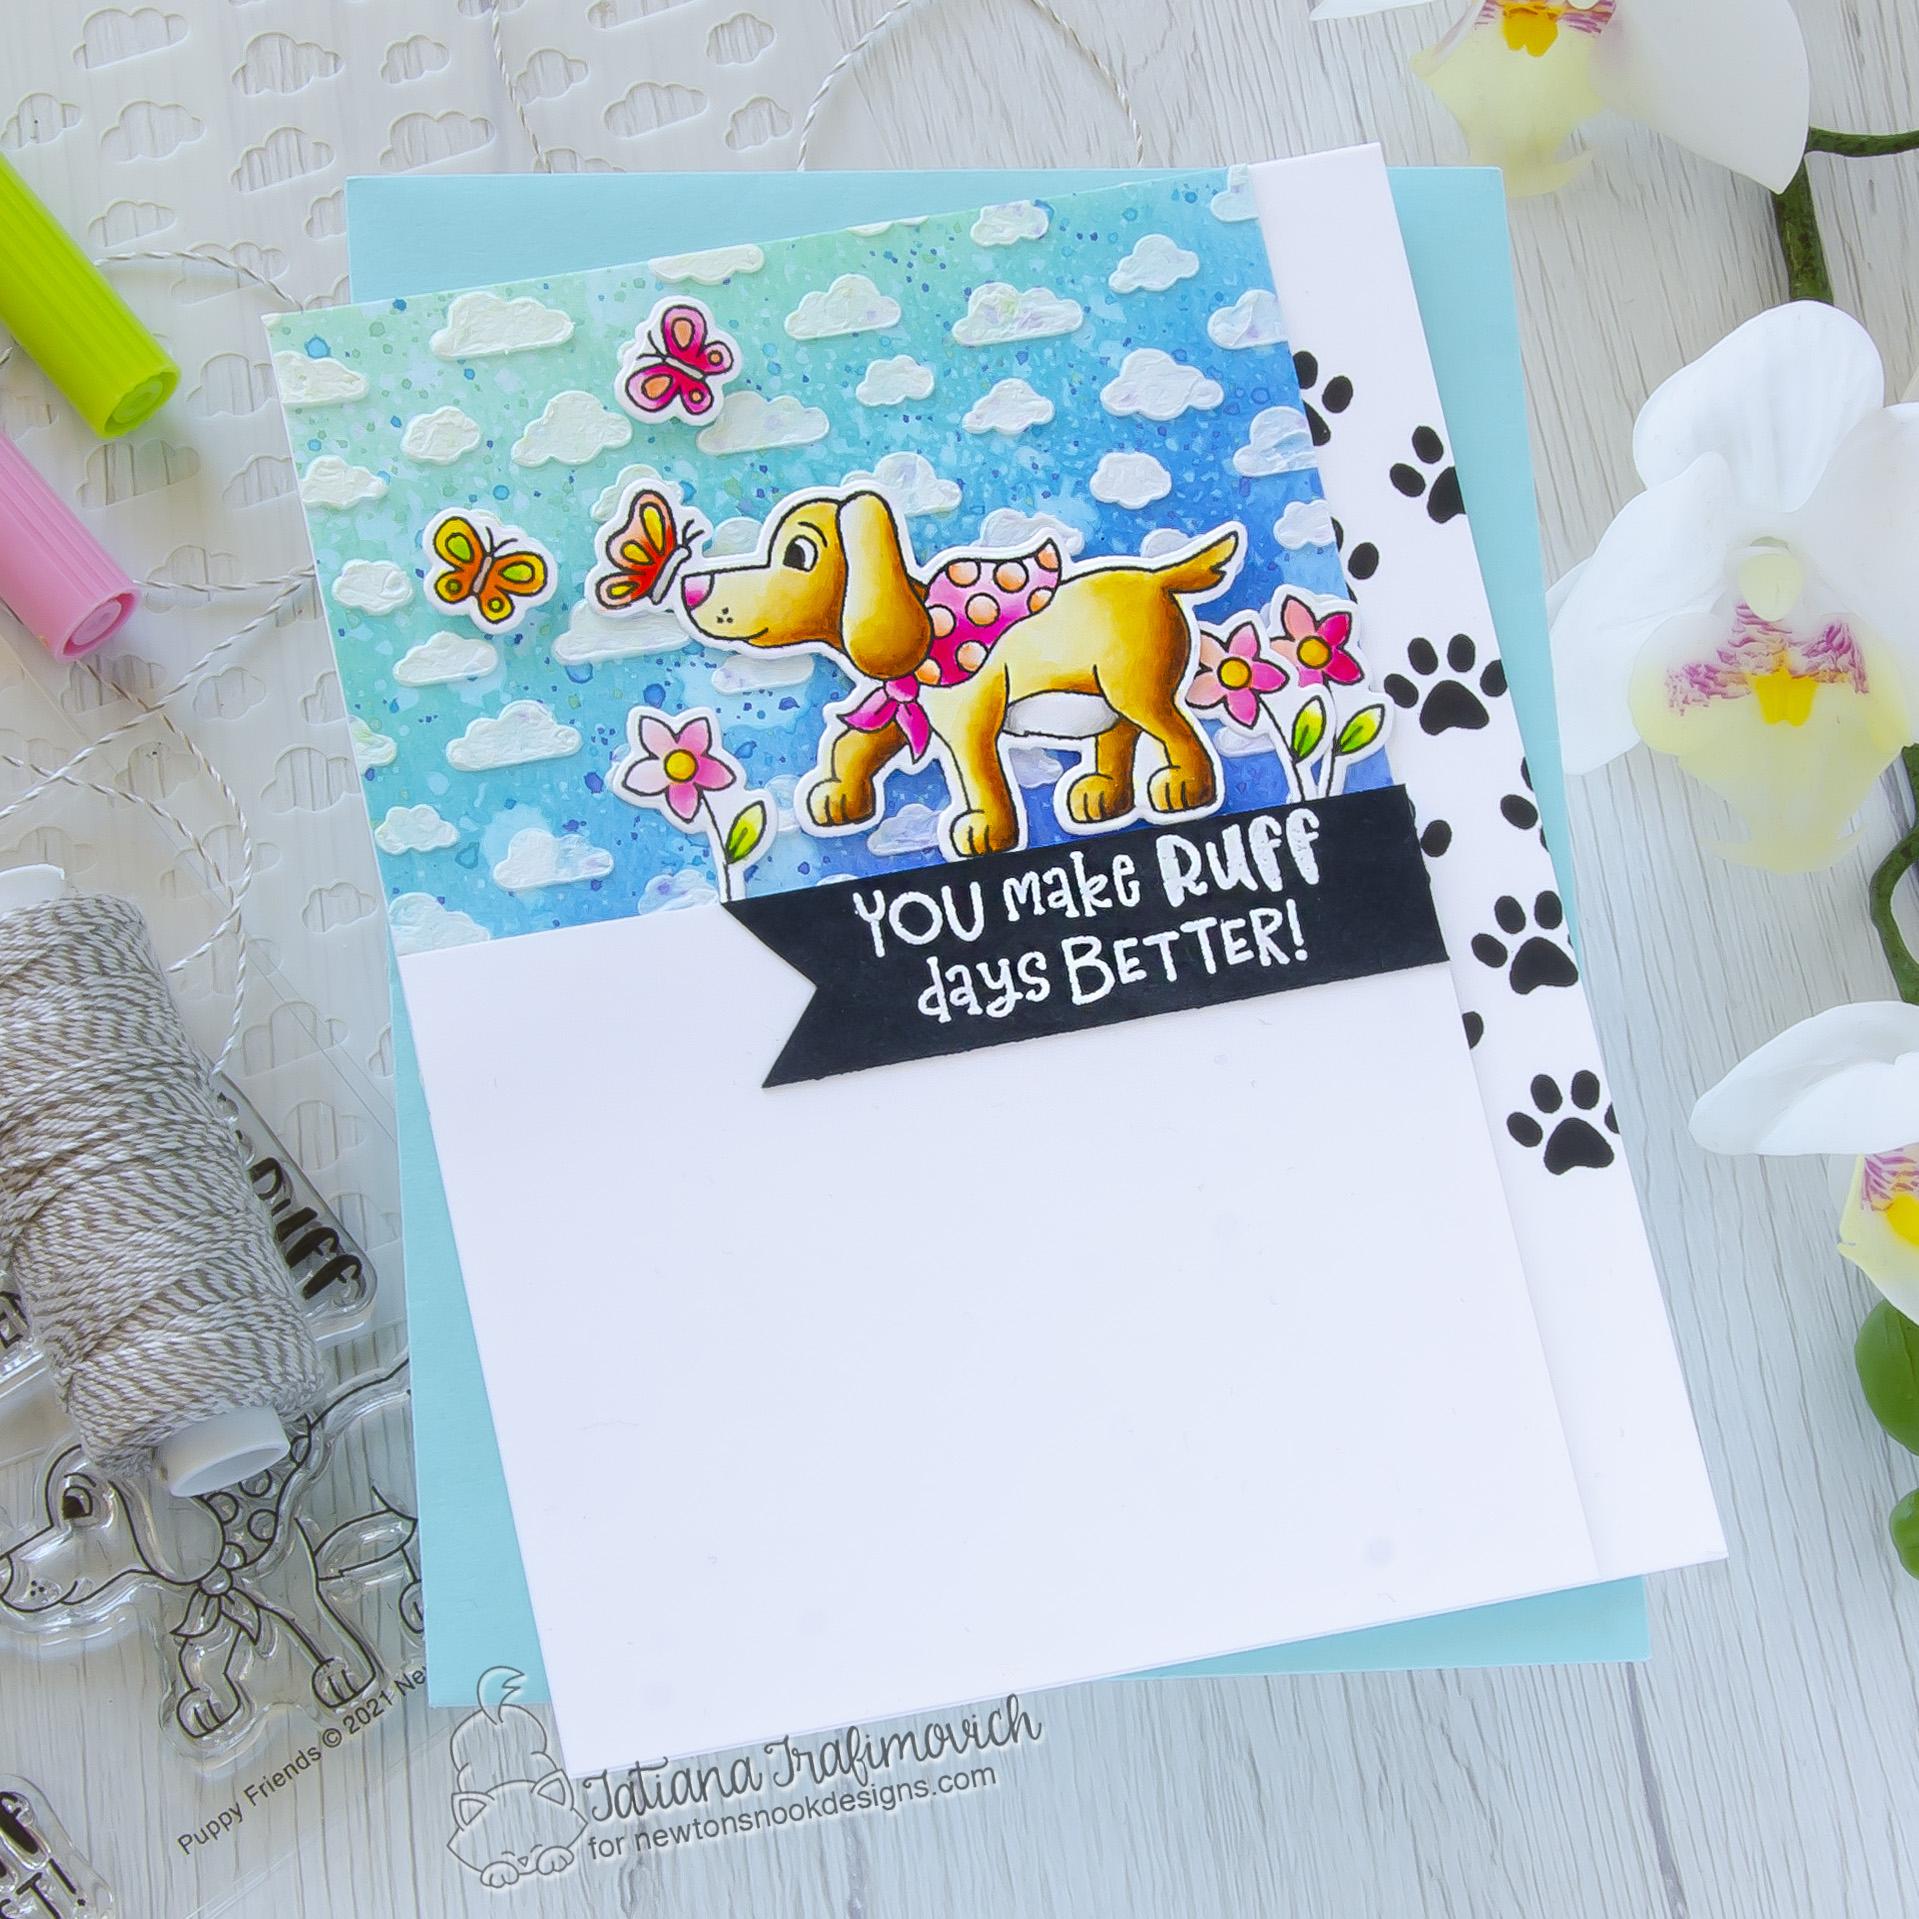 You Make Ruff Days Better #handmade card by Tatiana Trafimovich #tatianacraftandart - Puppy Friends stamp set by Newton's Nook Designs #newtonsnook